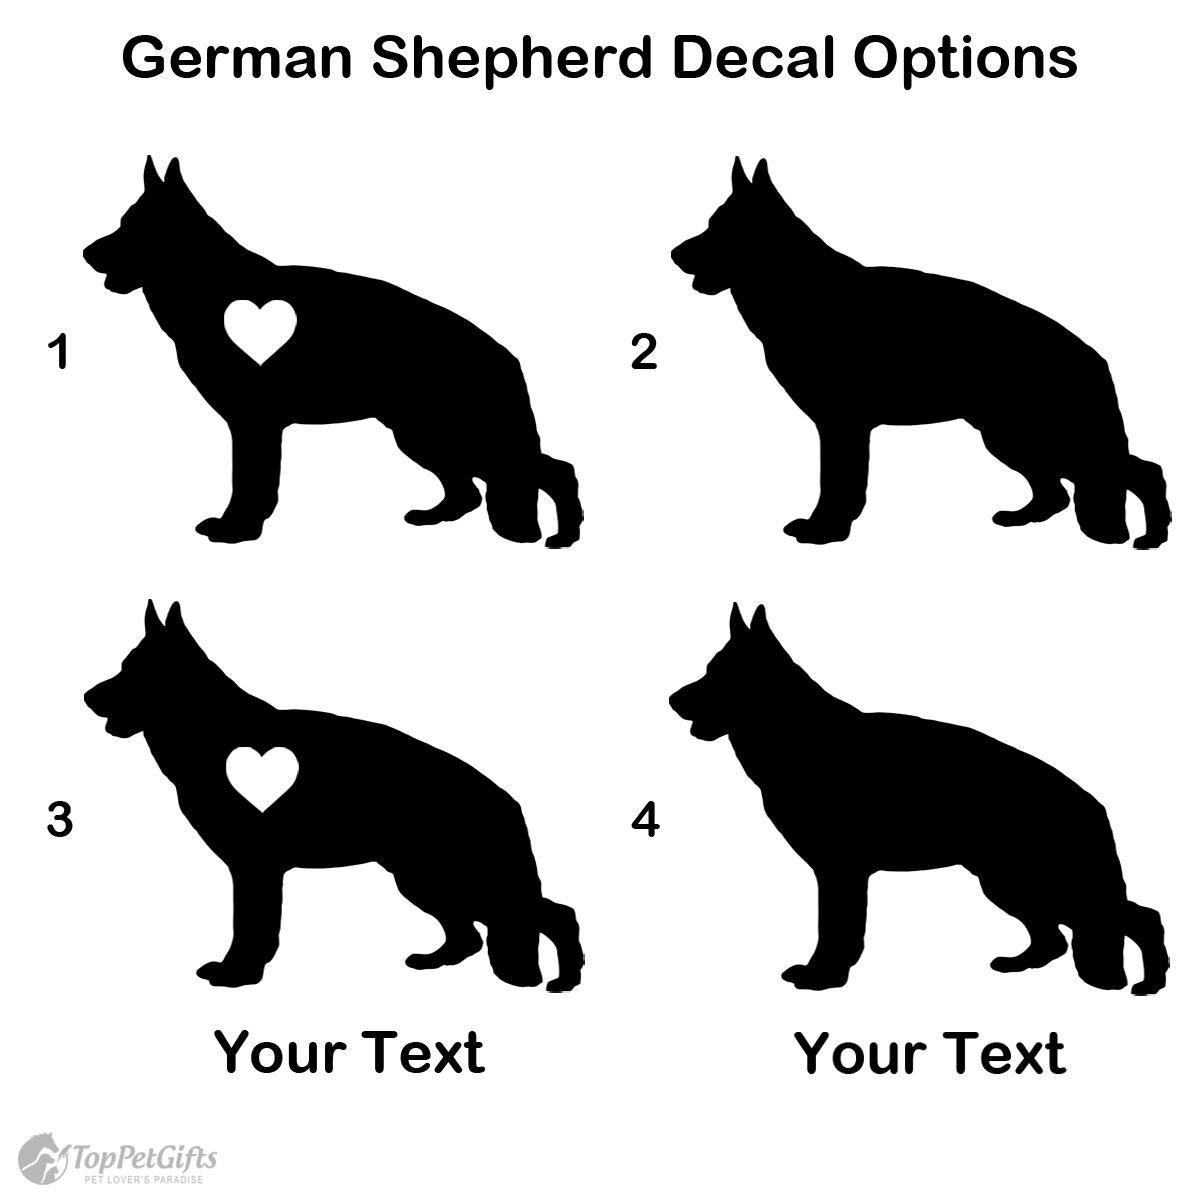 Personalized German Shepherd Decal